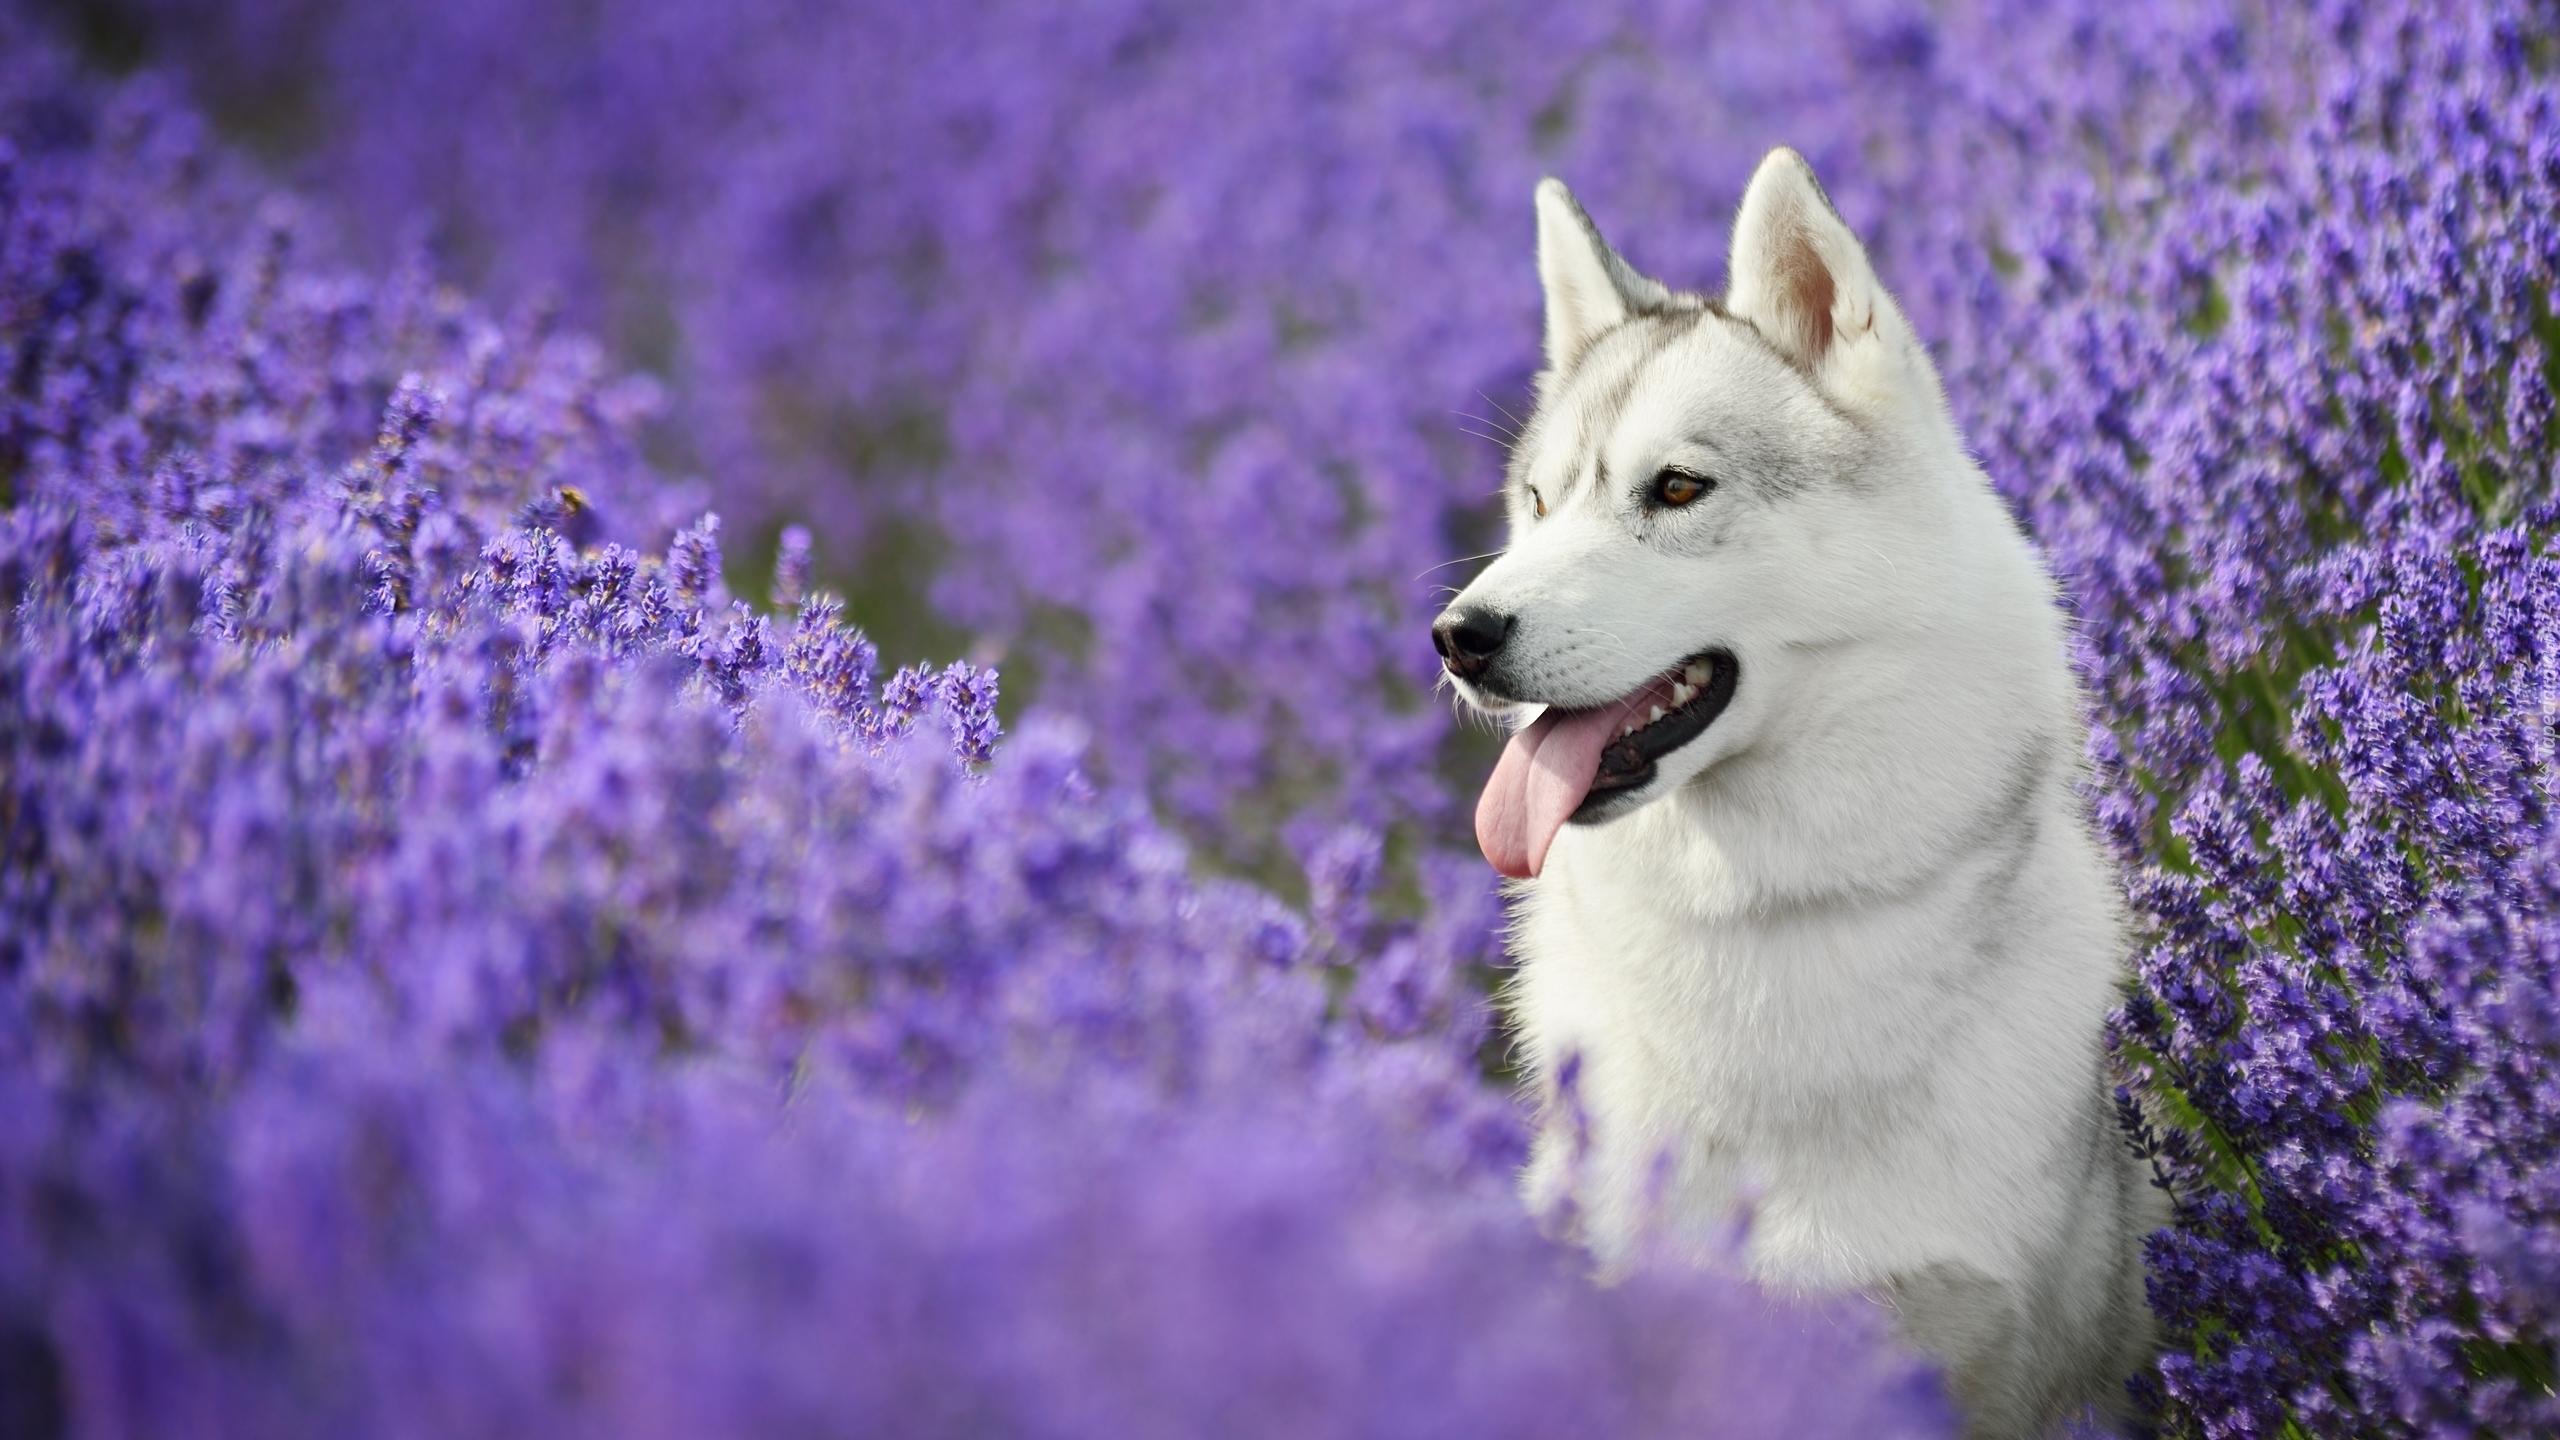 Siberian Husky Pośr 243 D Kwiat 243 W Lawendy